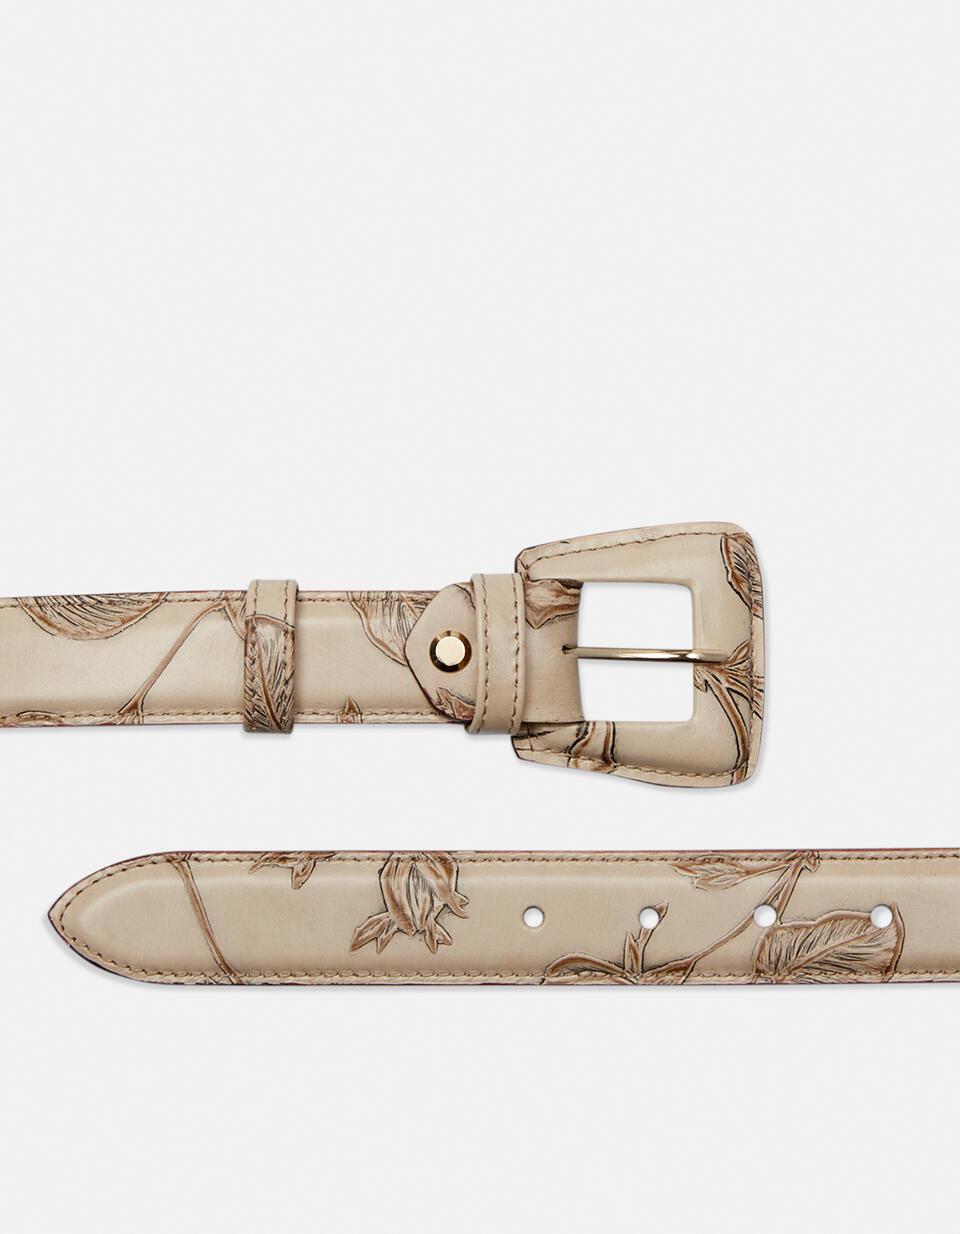 Cintura Mimì da donna media in pelle stampata a rose con fibbia fasciata  Cuoieria Fiorentina